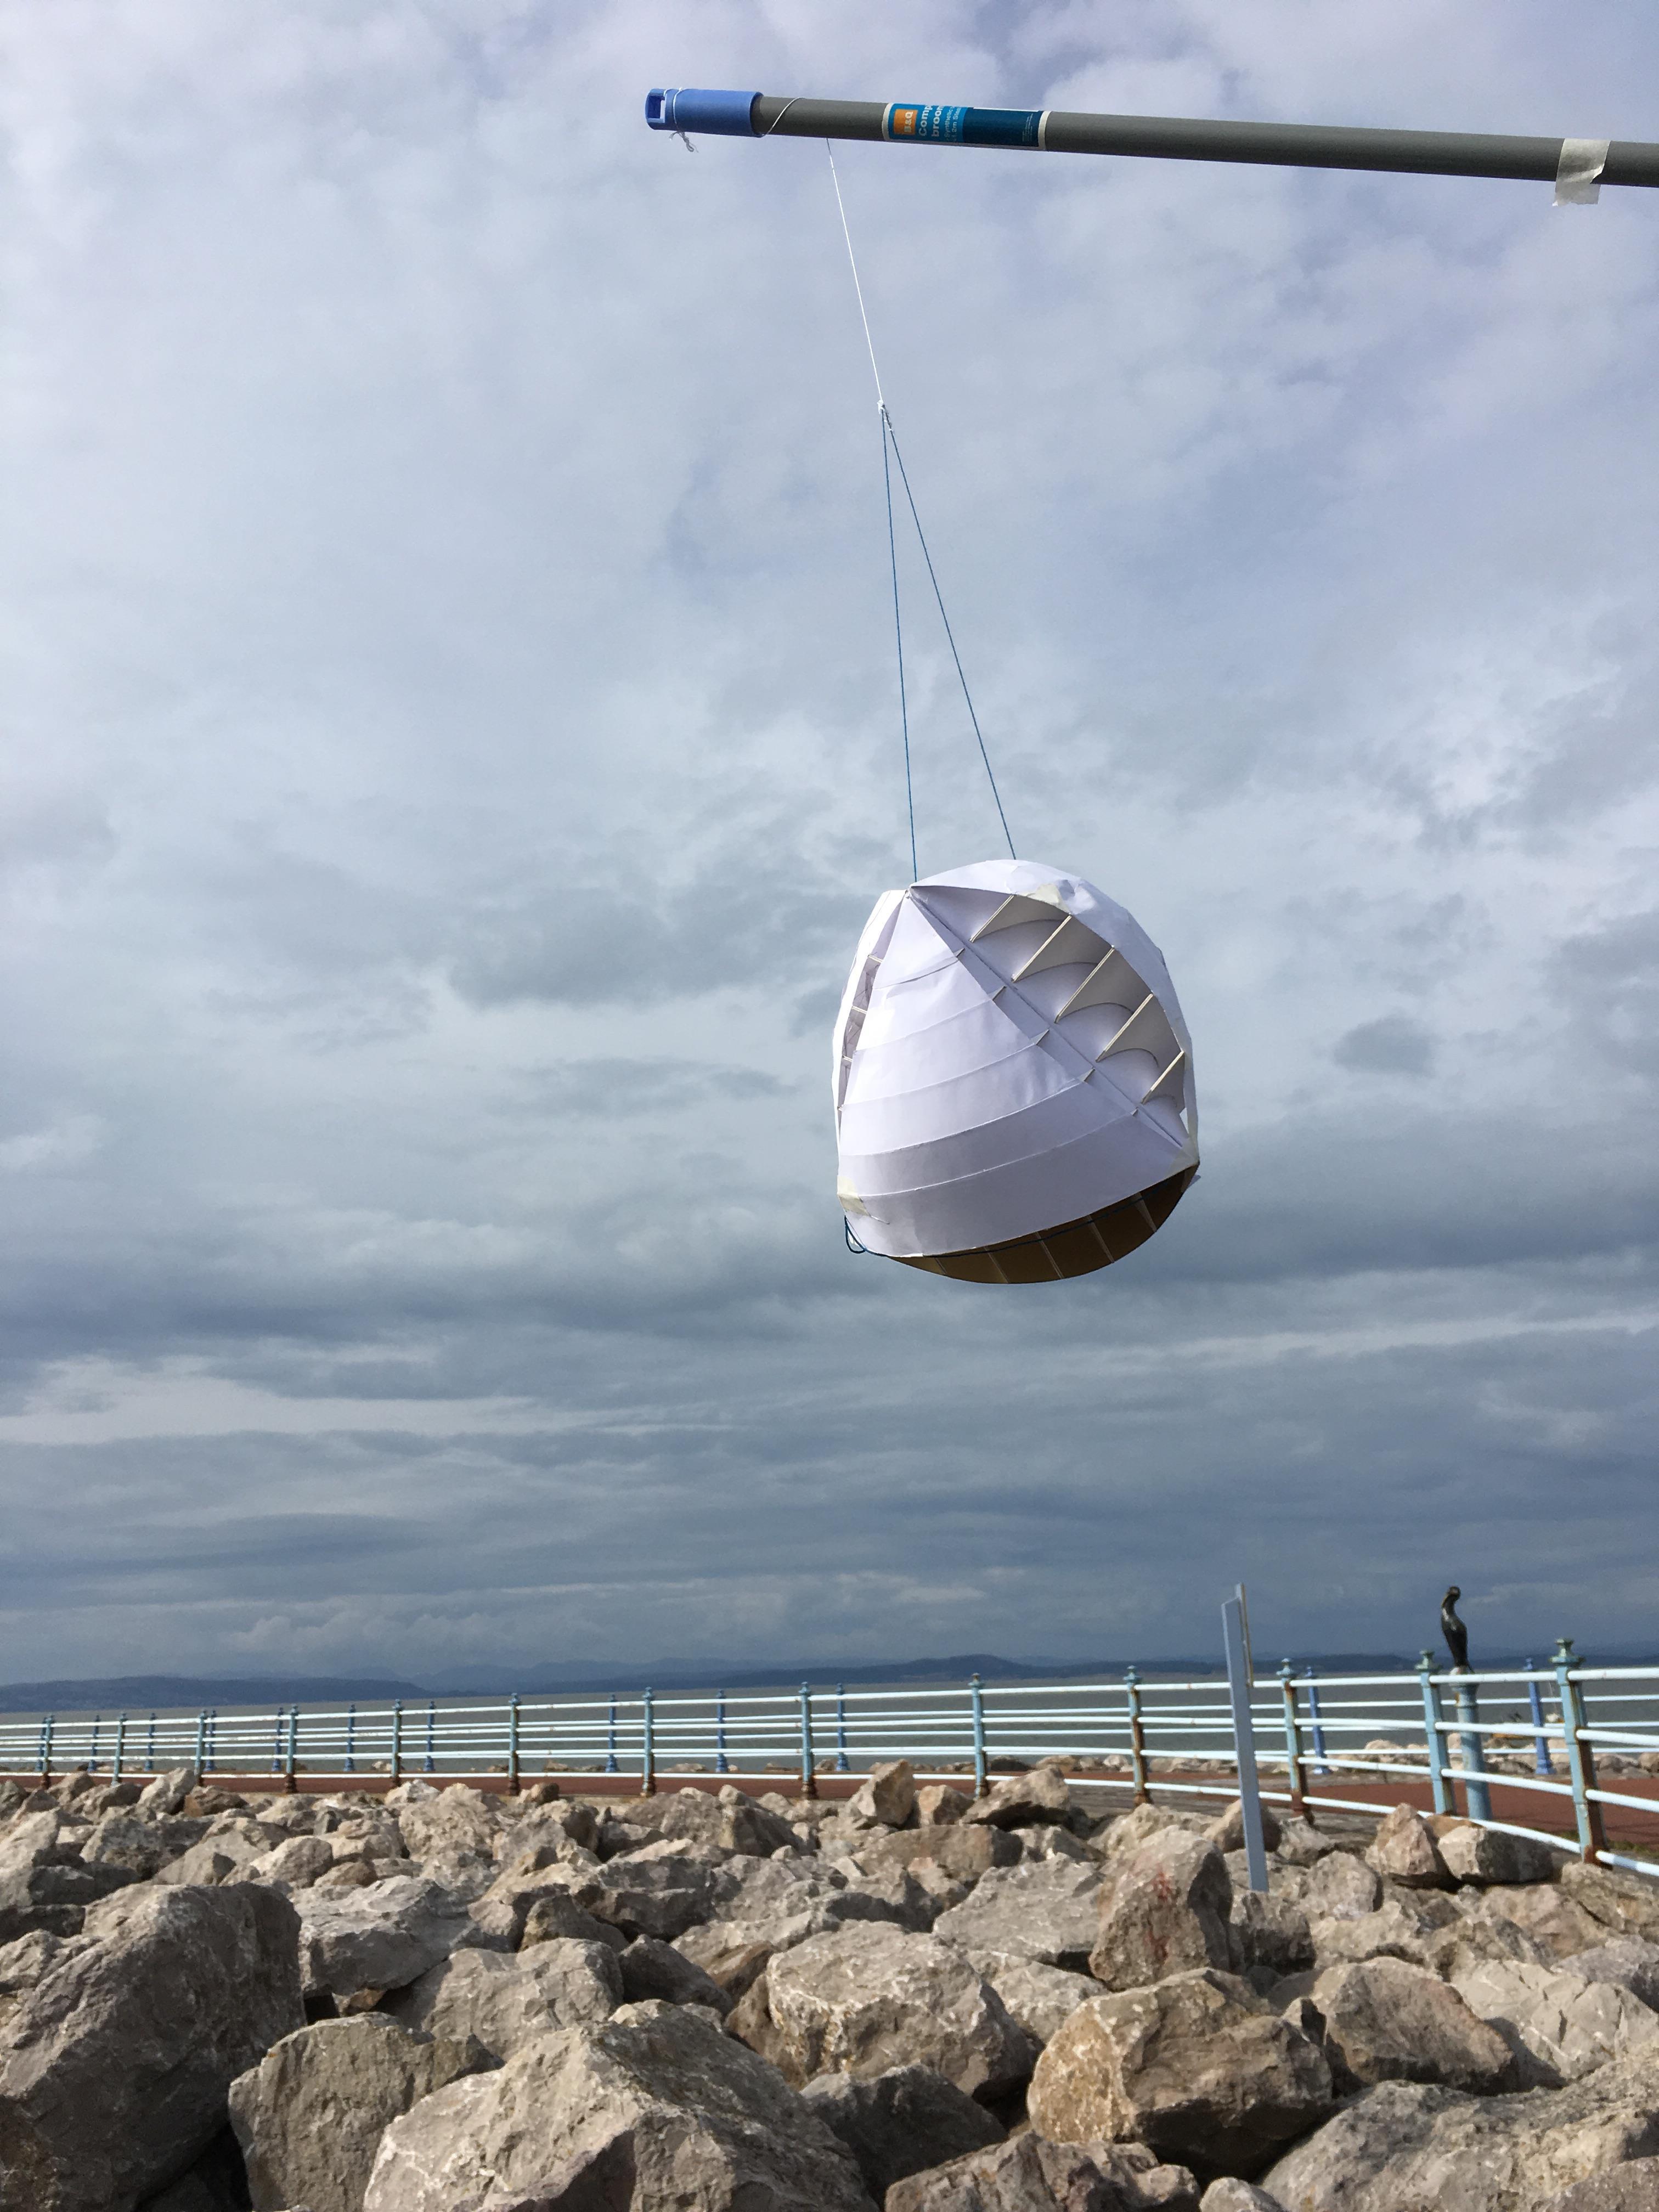 New O-Wind turbine wins UK Dyson award - Climate Action